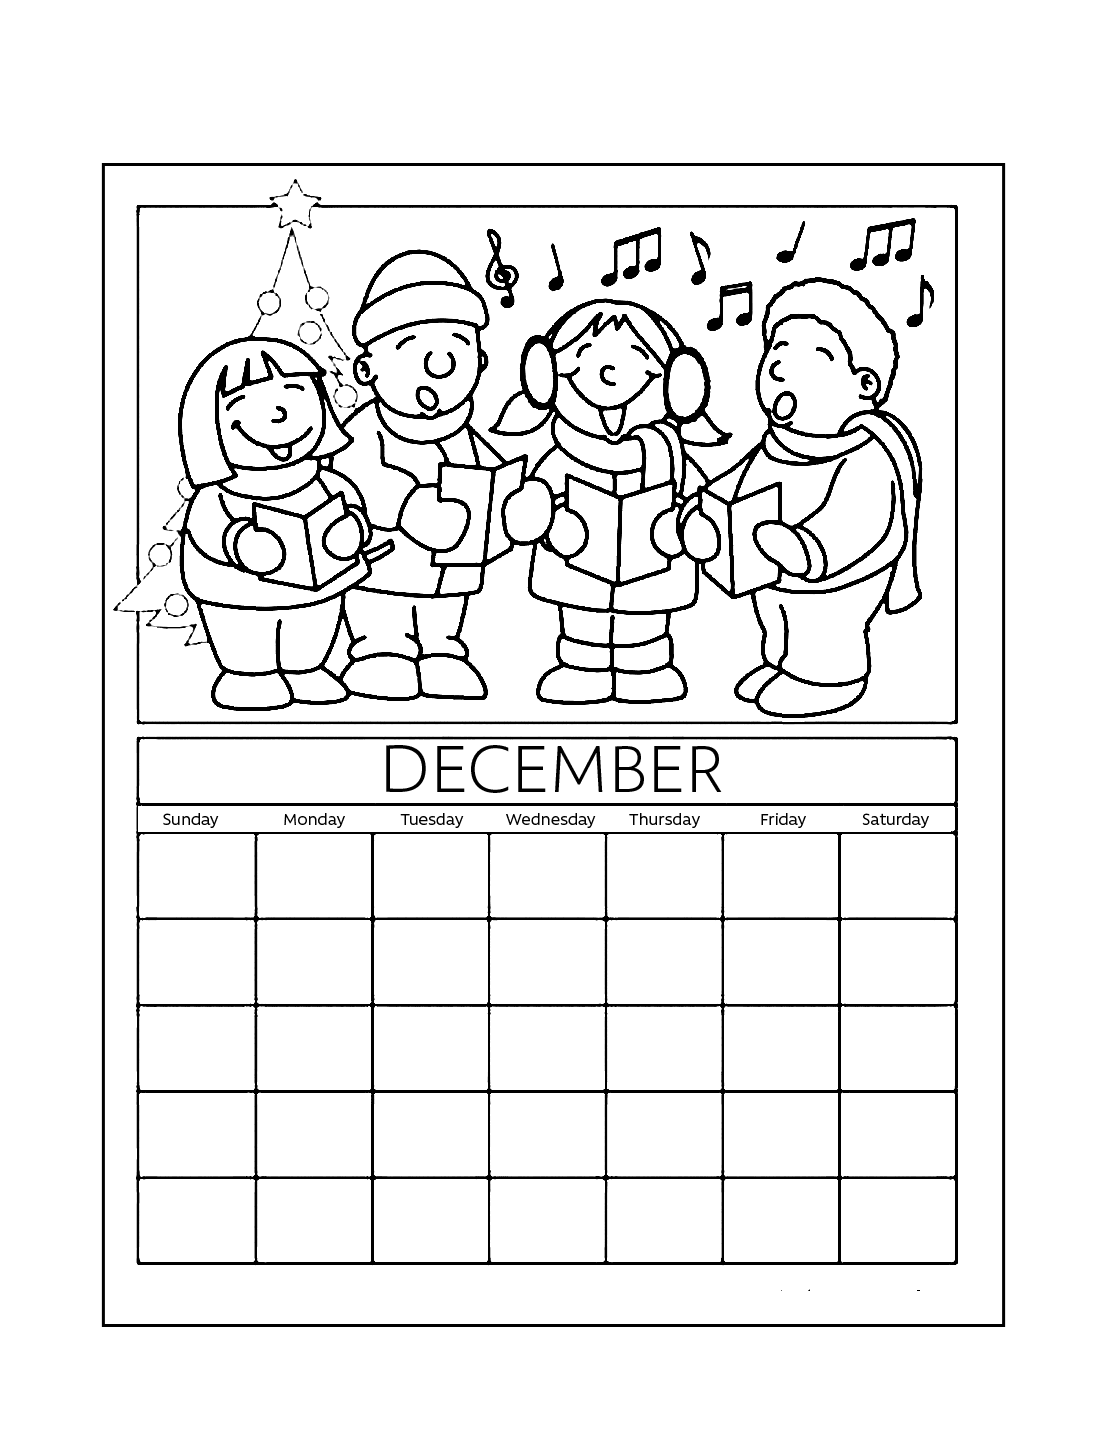 December Calendar Coloring Sheet